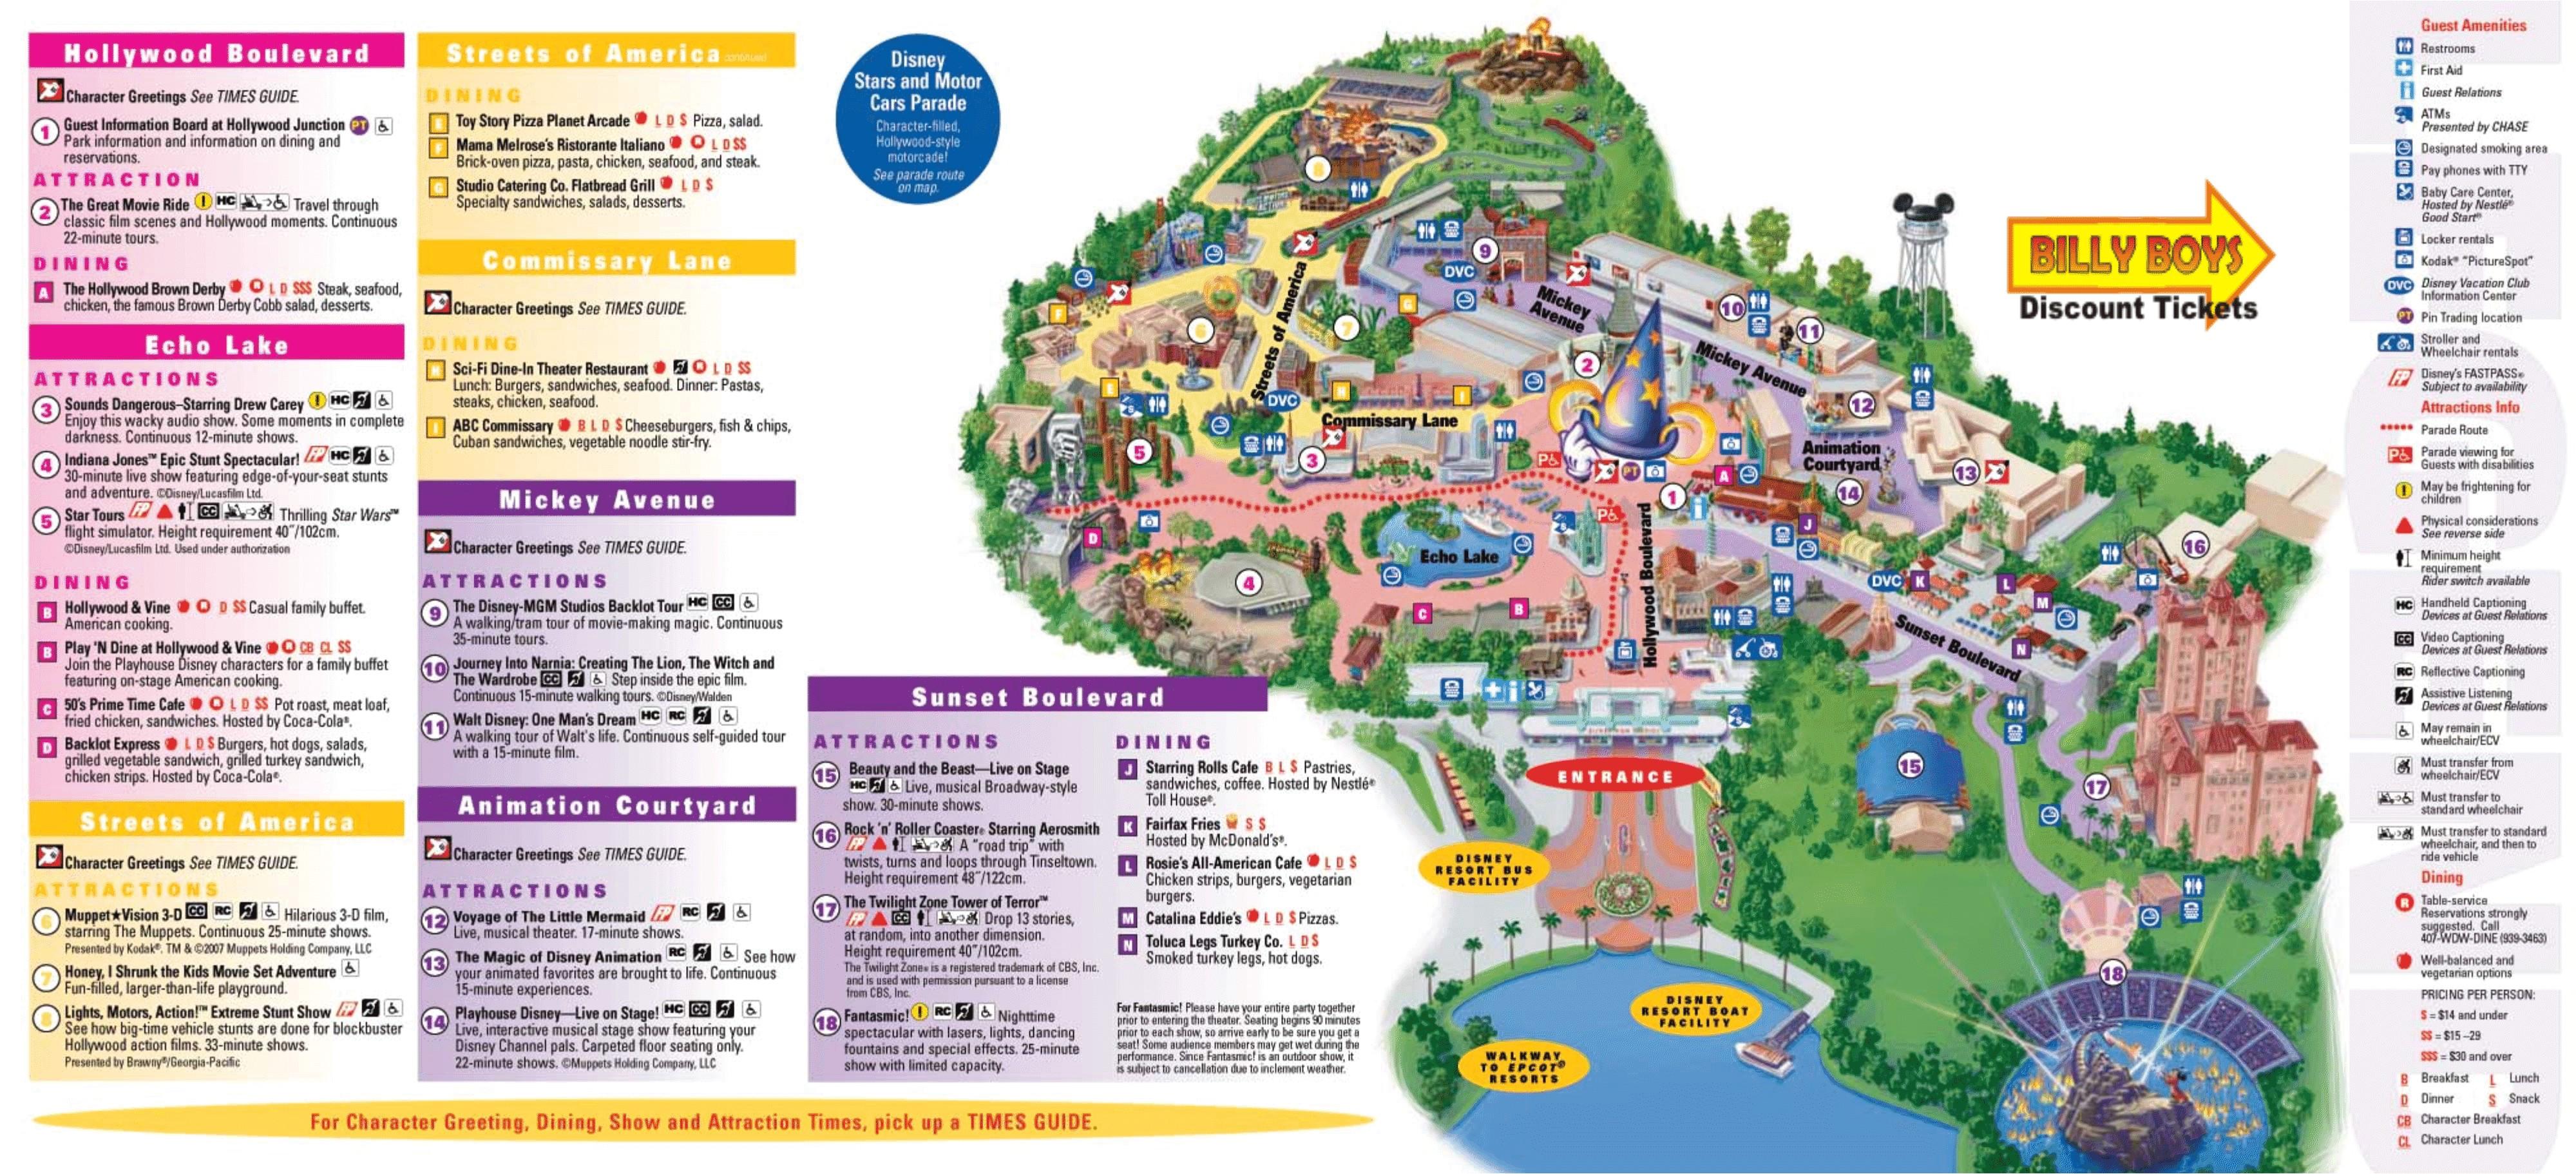 disney california adventure map pdf detailed google map disney world inspirational google maps disneyland california